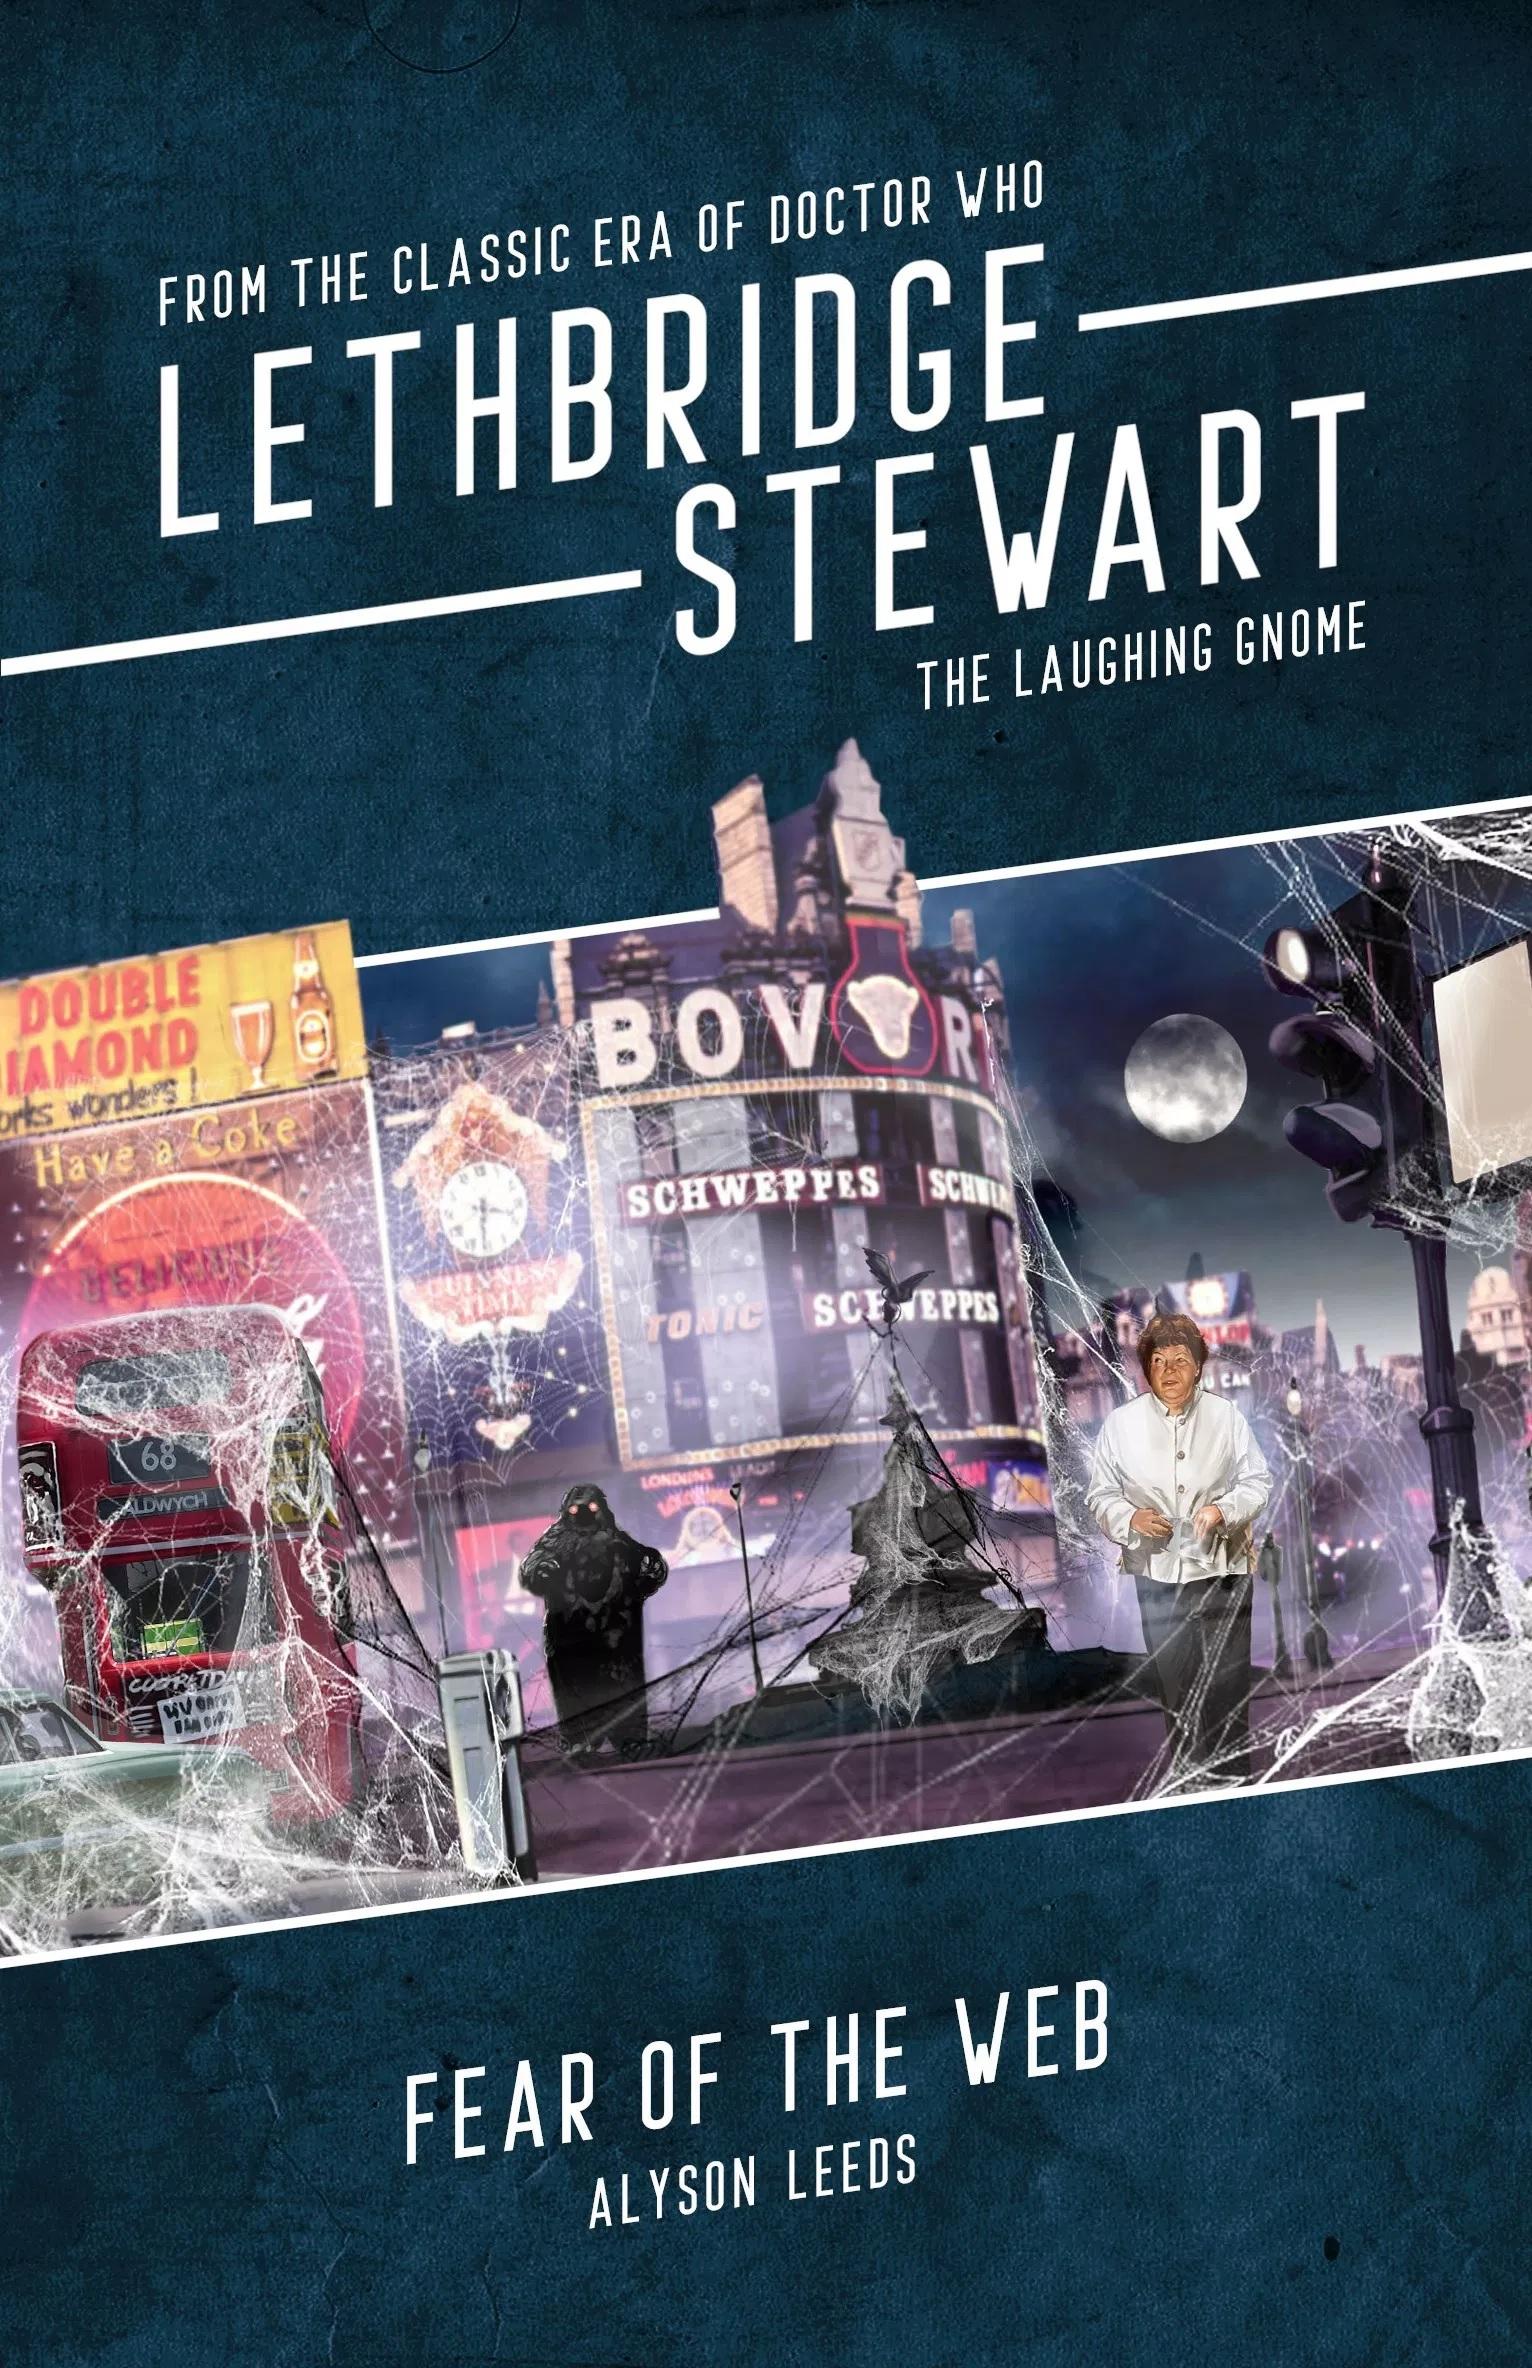 Enjoy Lethbridge-Stewart: Fear of the Web on Kindle – Completely Free!